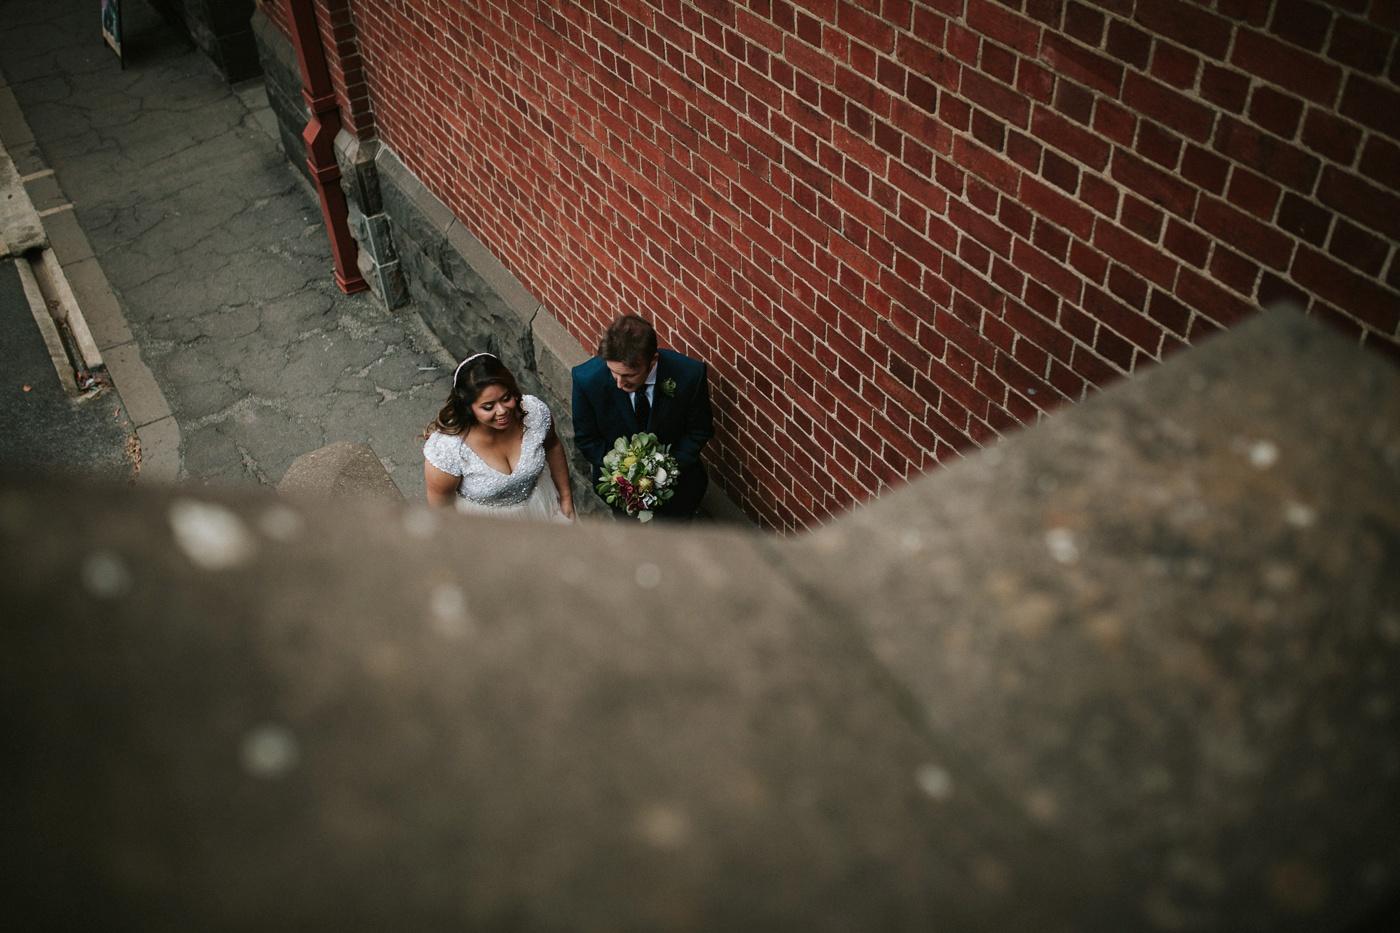 anitadaniel_melbourne-scienceworks-relaxed-fun-geek-wedding_melbourne-candid-wedding-photography_11